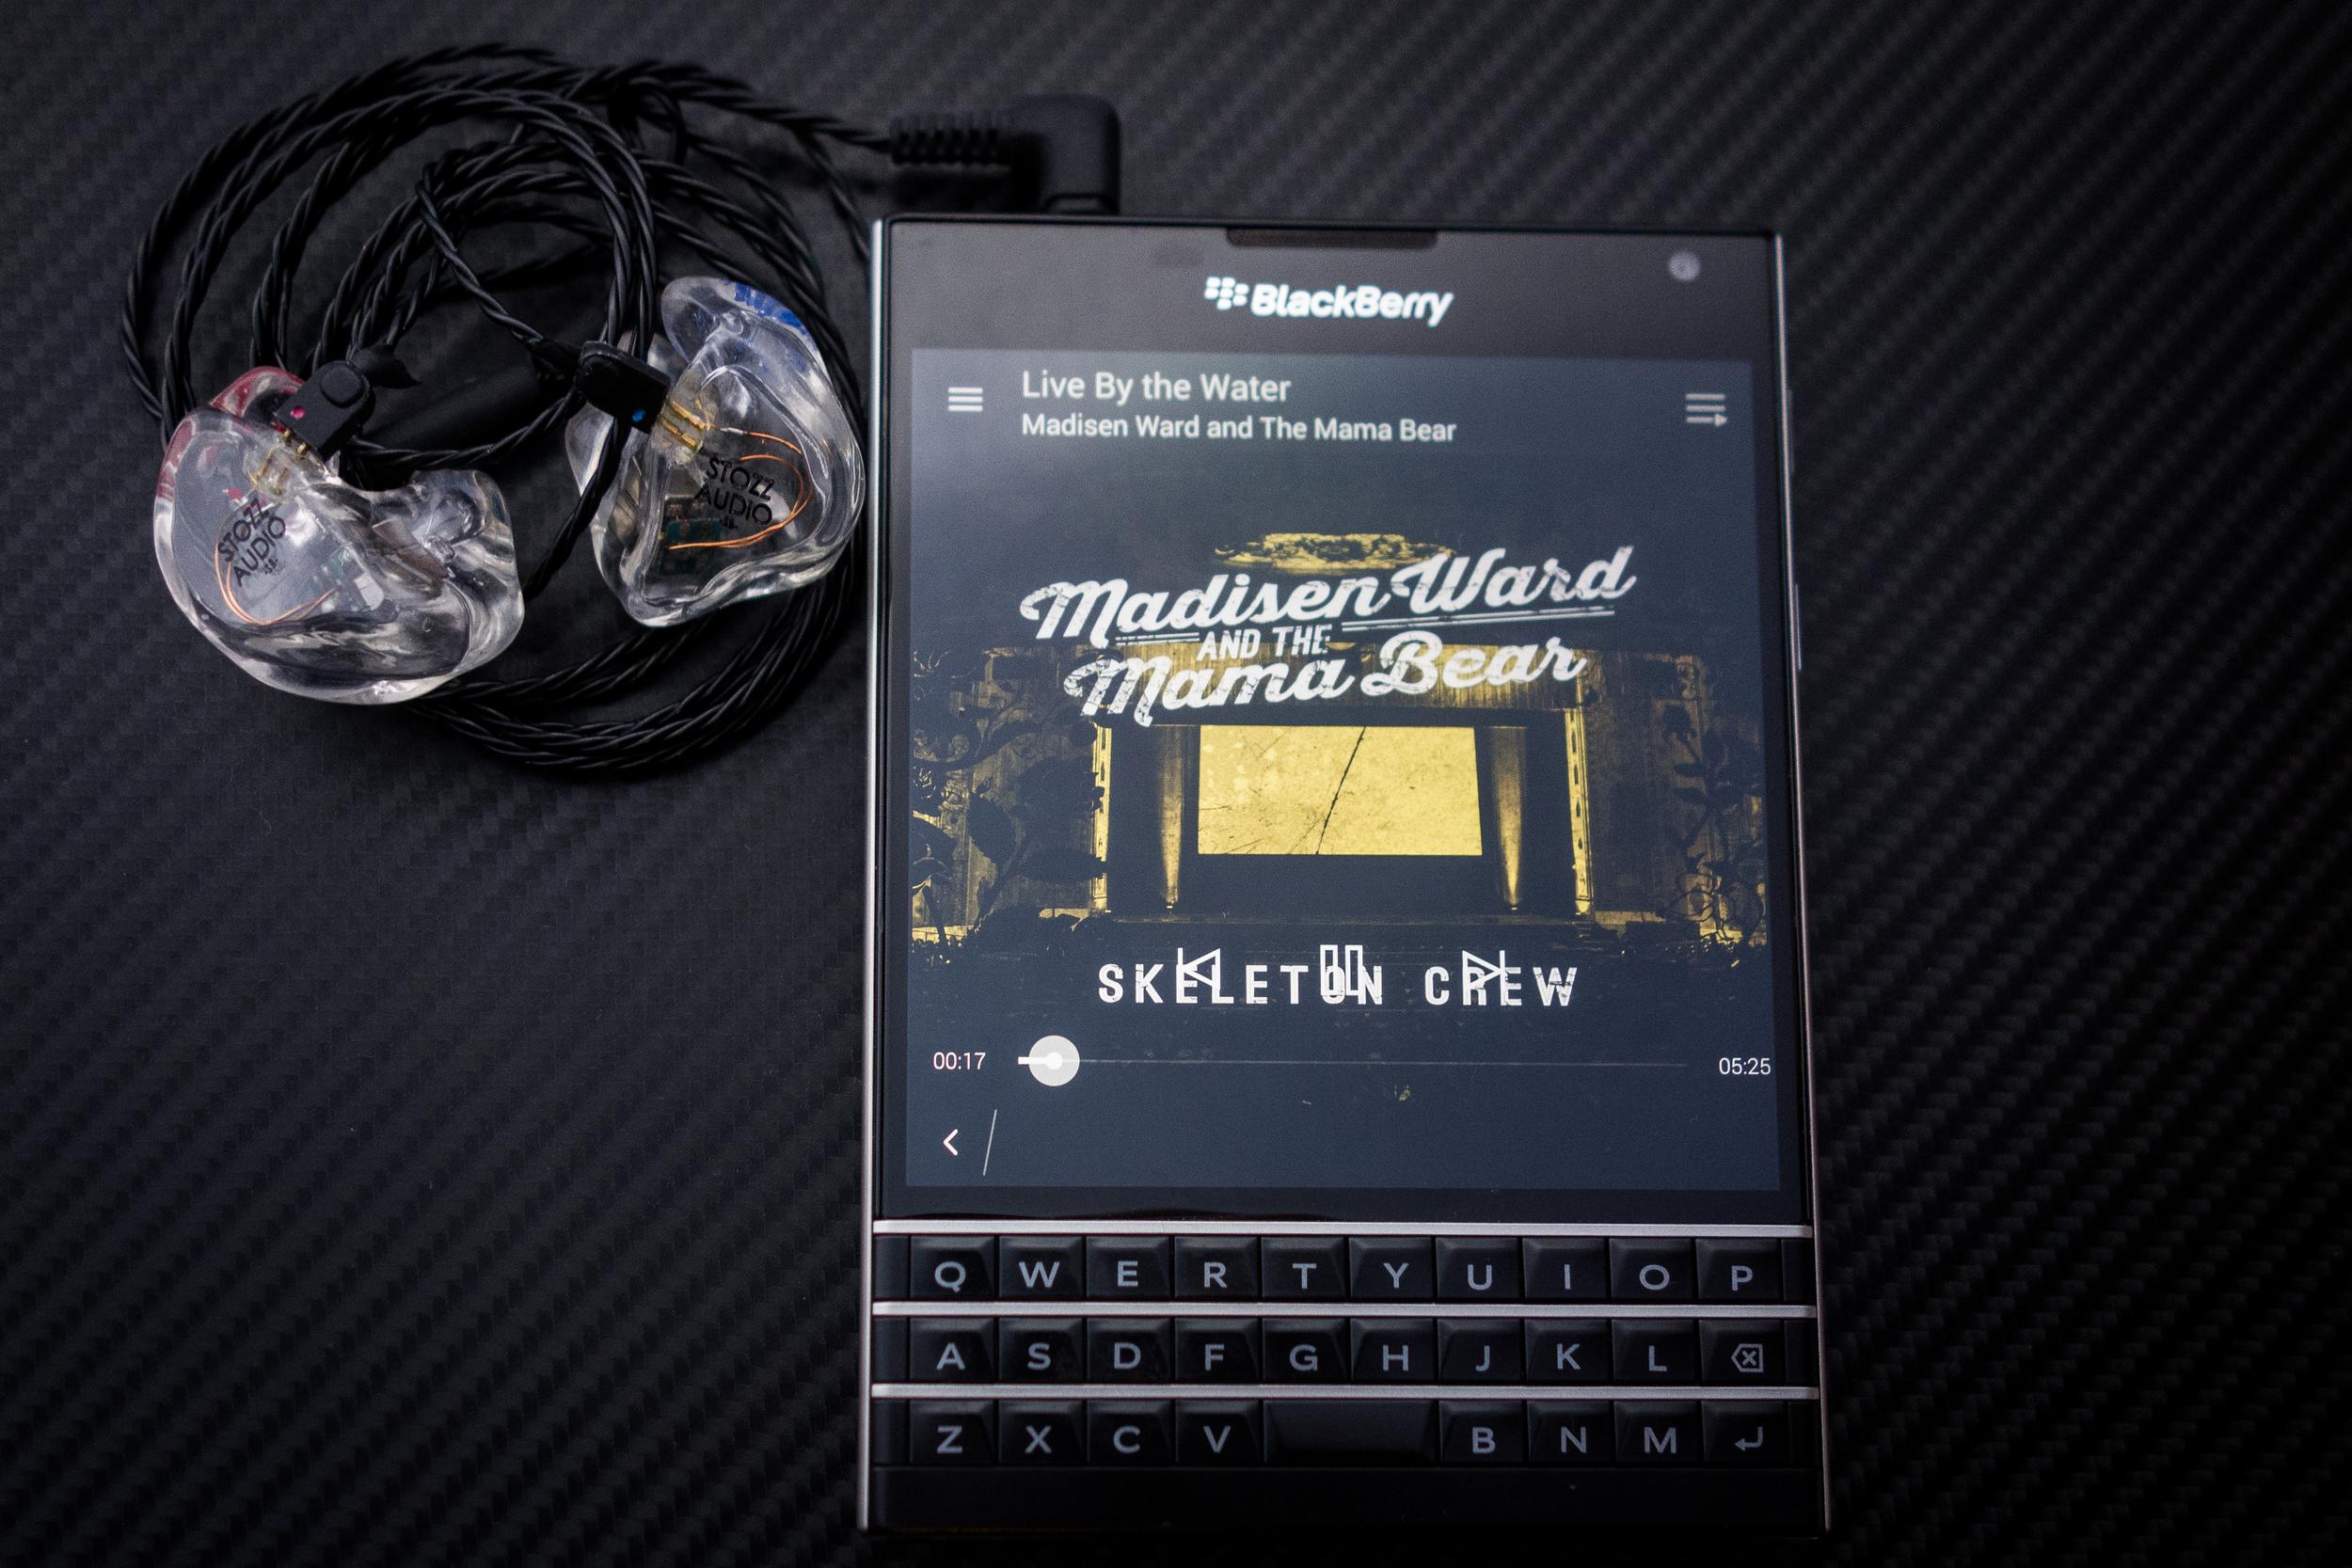 Perfectly balanced - Very nice Performance through the Blackberry Passport &Minerva Customs